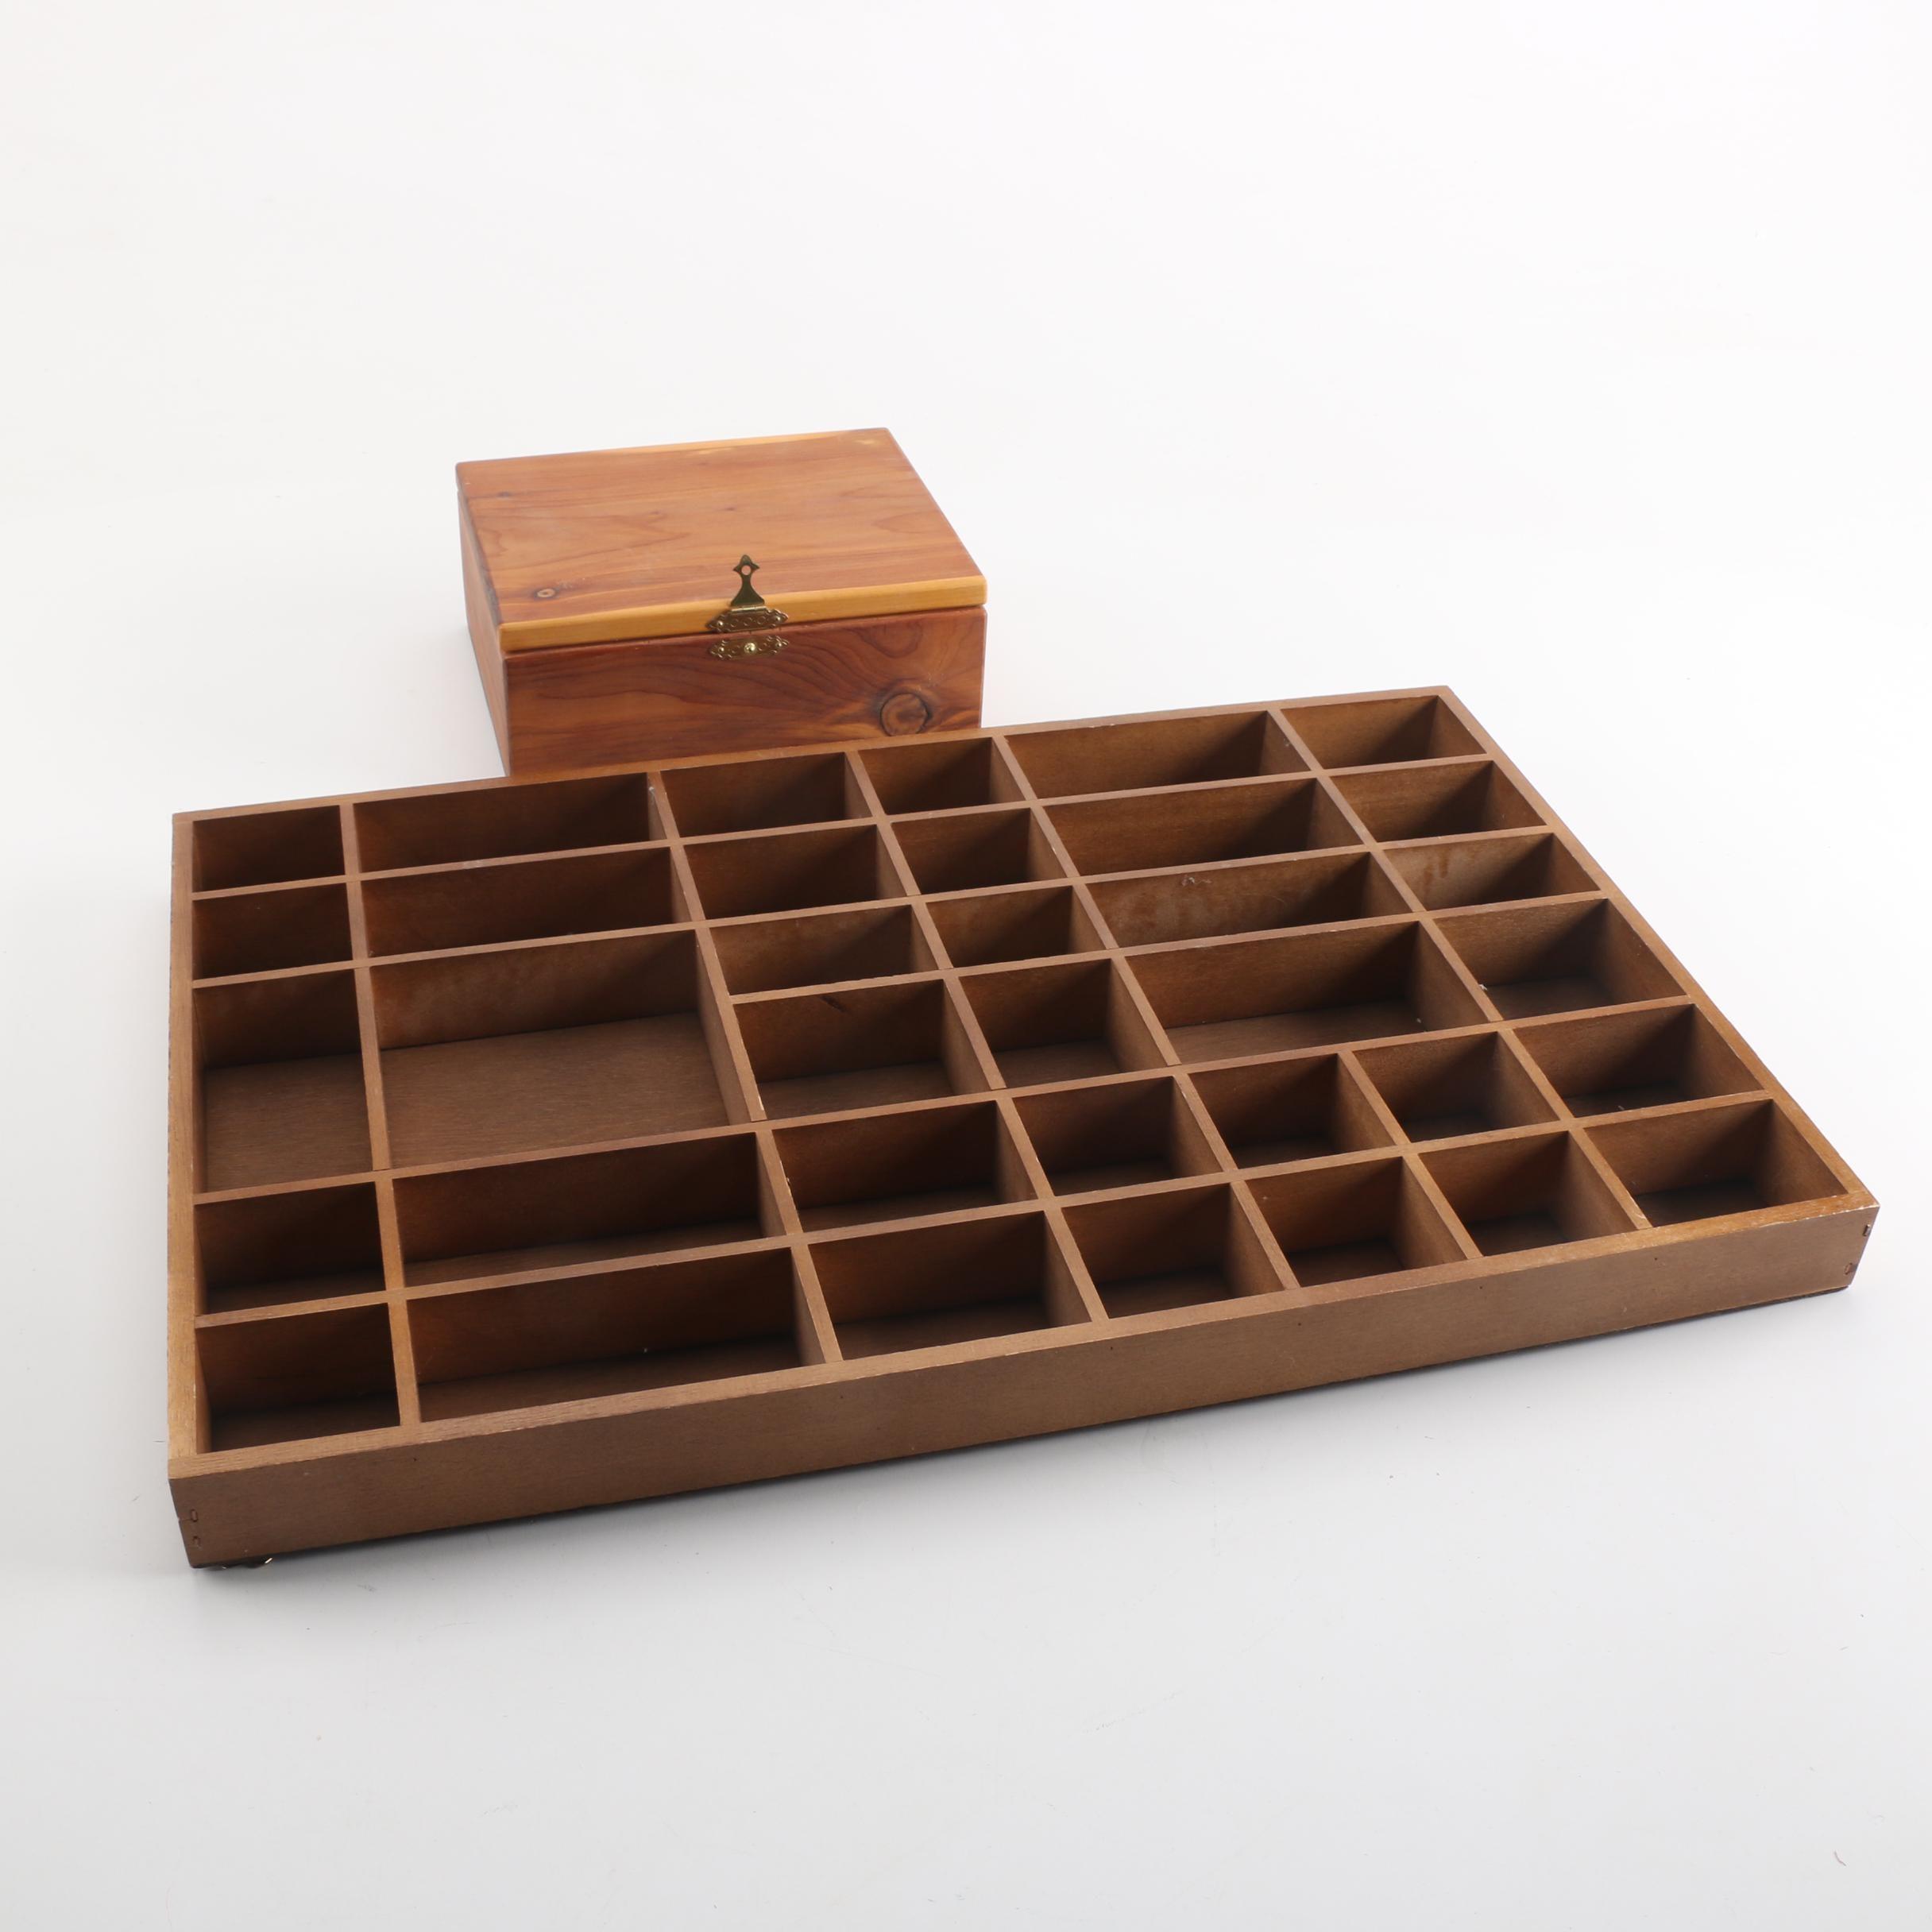 Wooden Printer's Typeset Tray and Cedar Box